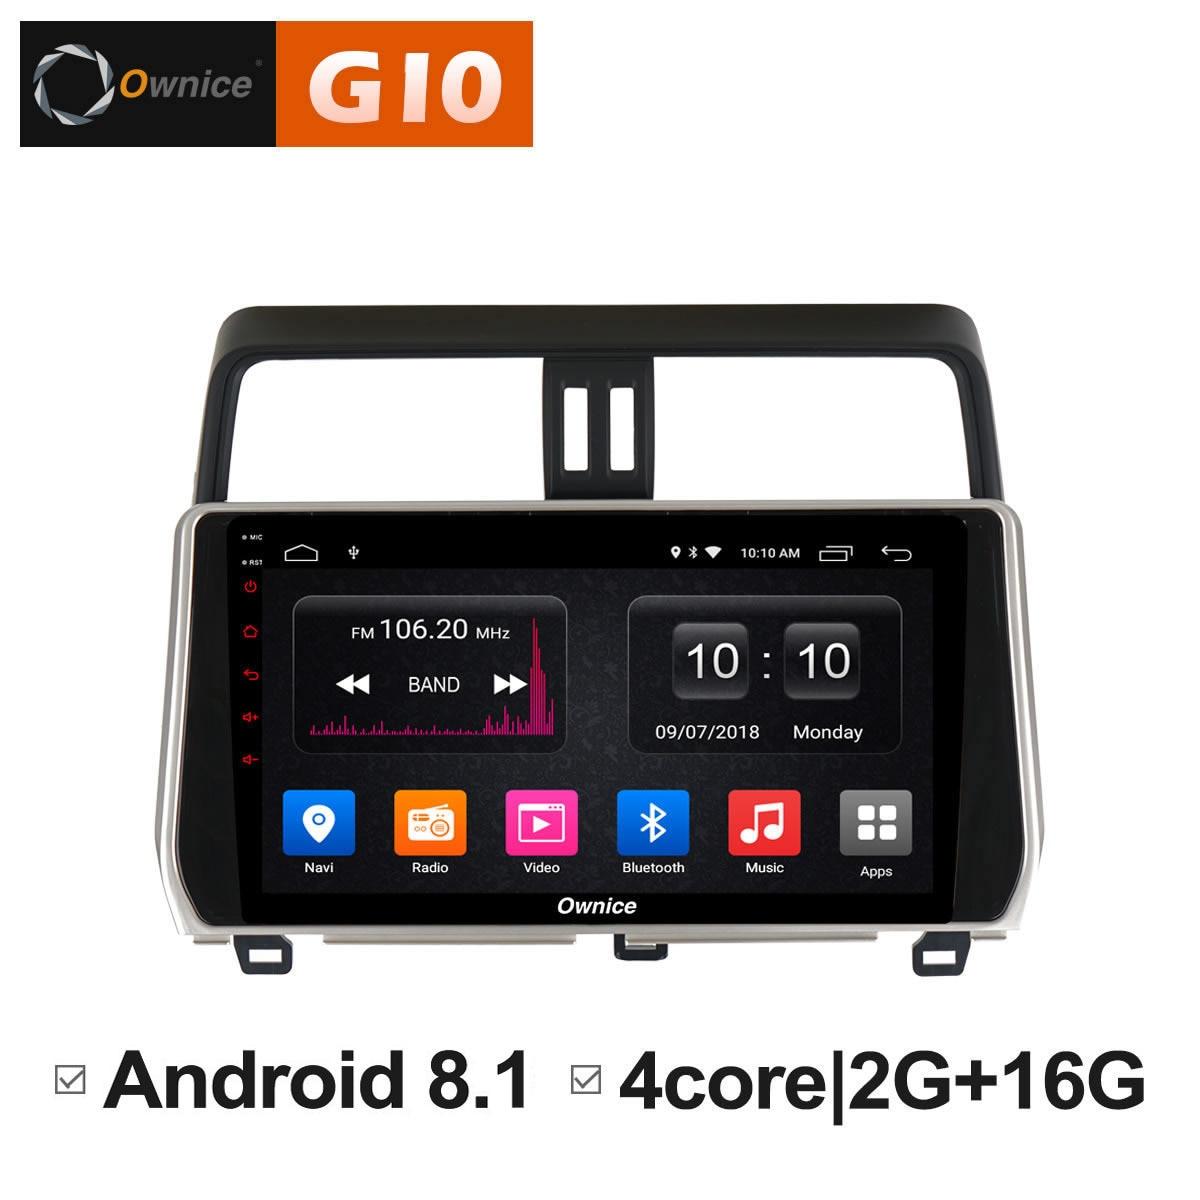 все цены на Android 8.1 Unit Intelligent System Car DVD Radio Video Multimedia Player For Toyota Land Cruiser prado 2018 Stereo GPS Navi DVR онлайн